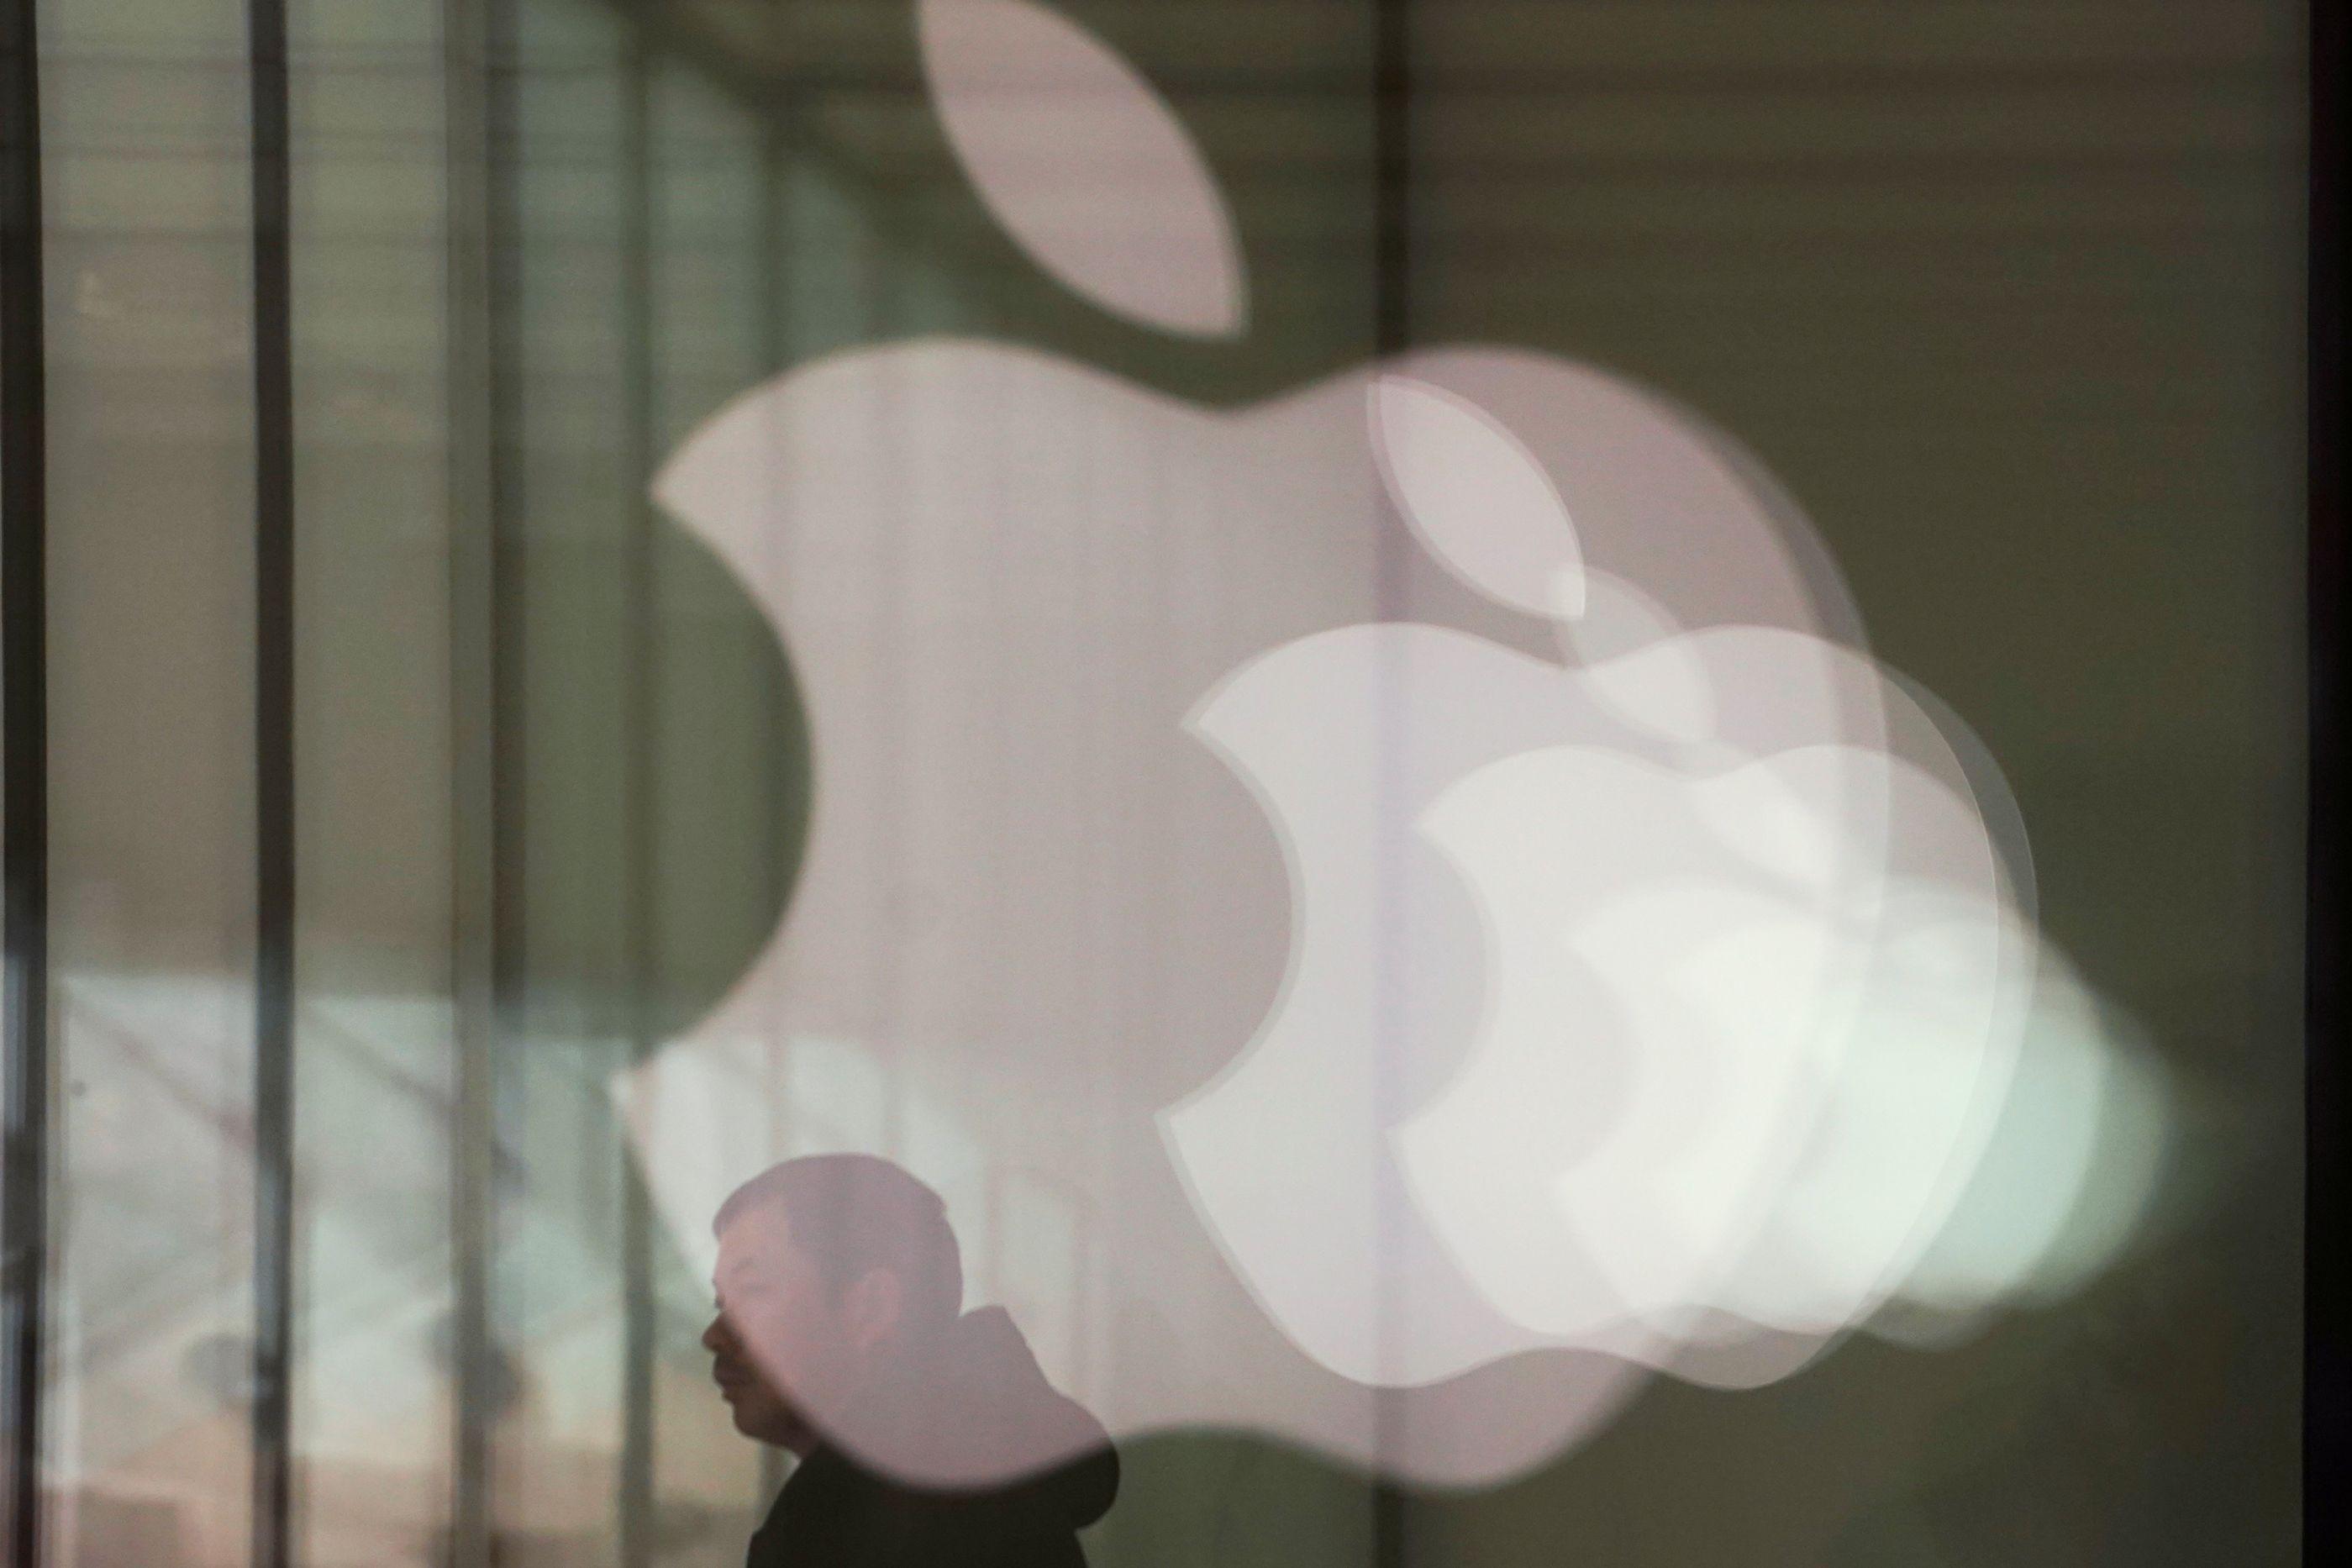 Óculos da Apple chega no final de 2019